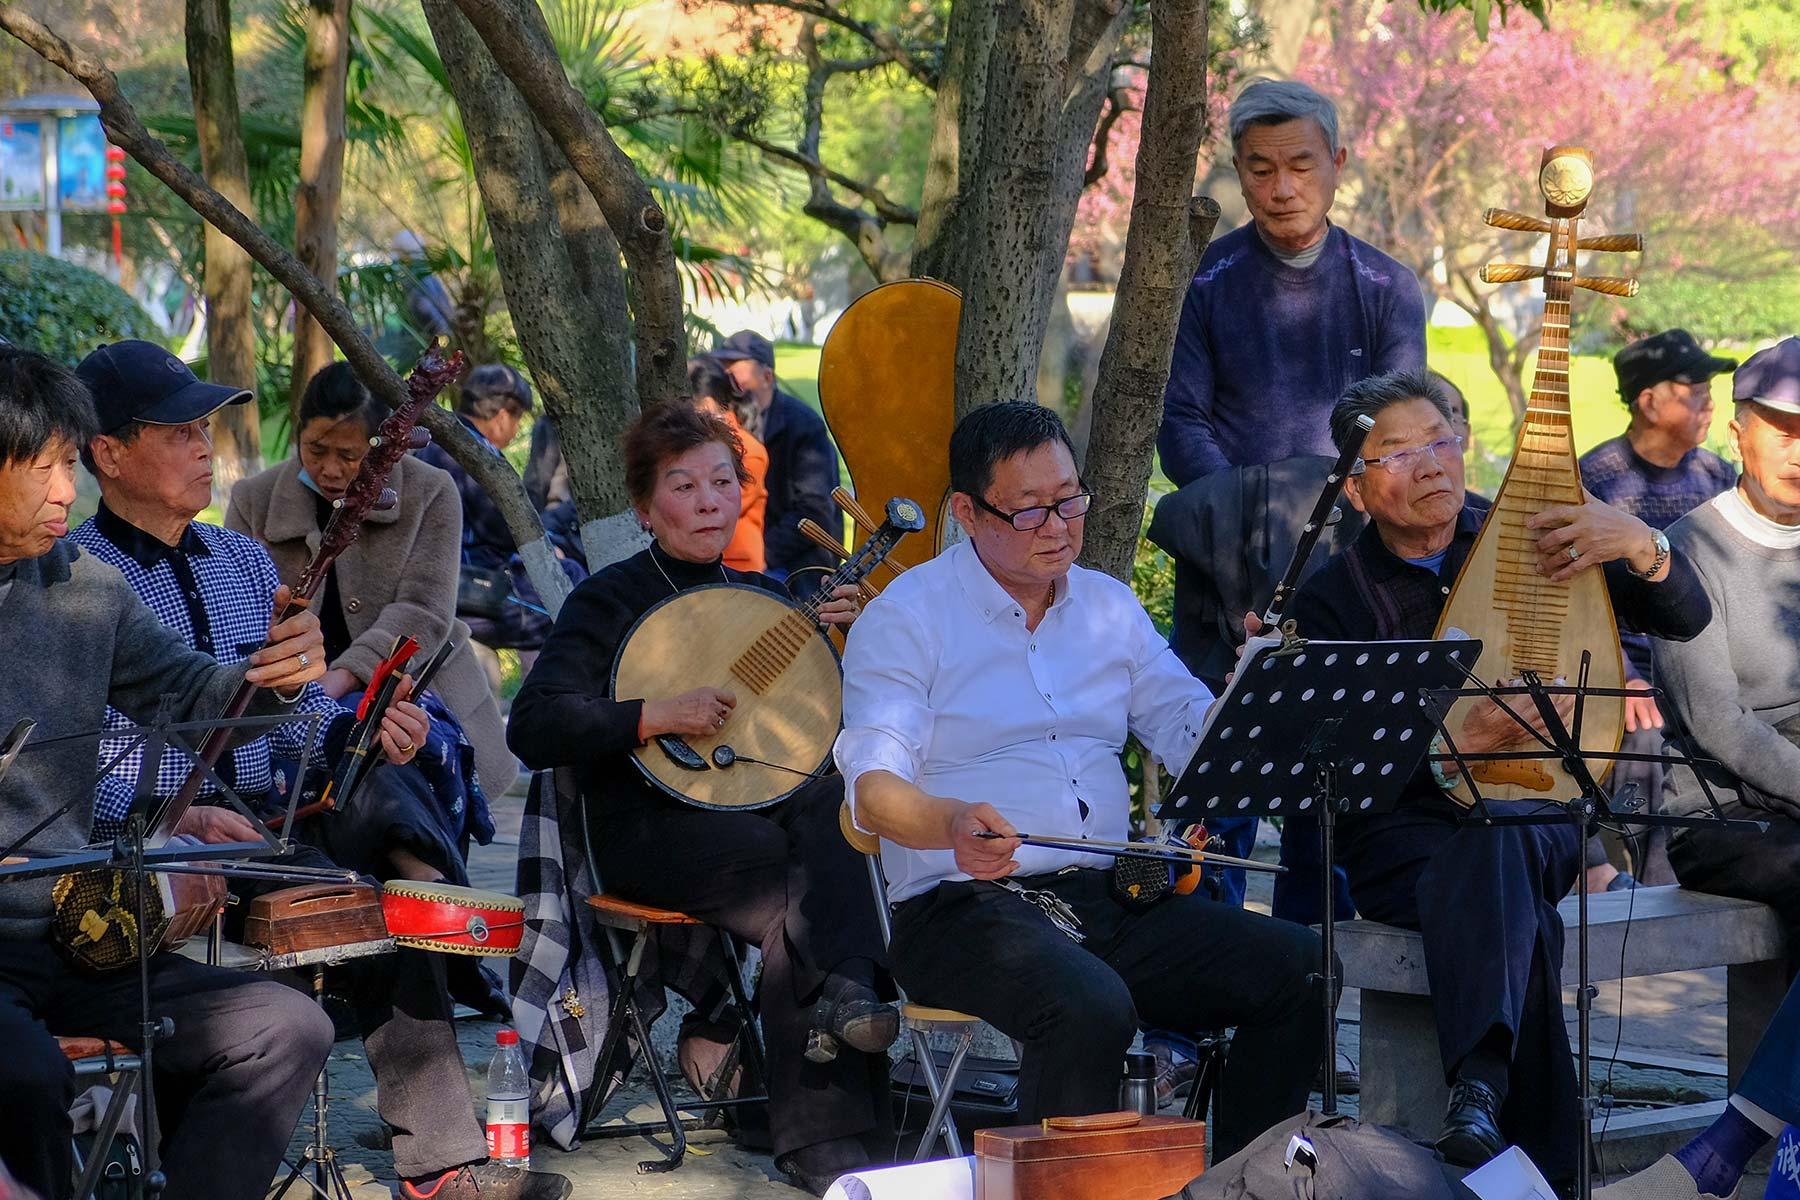 Musik und Besucher im Zhongshan Park in Ningbo, China